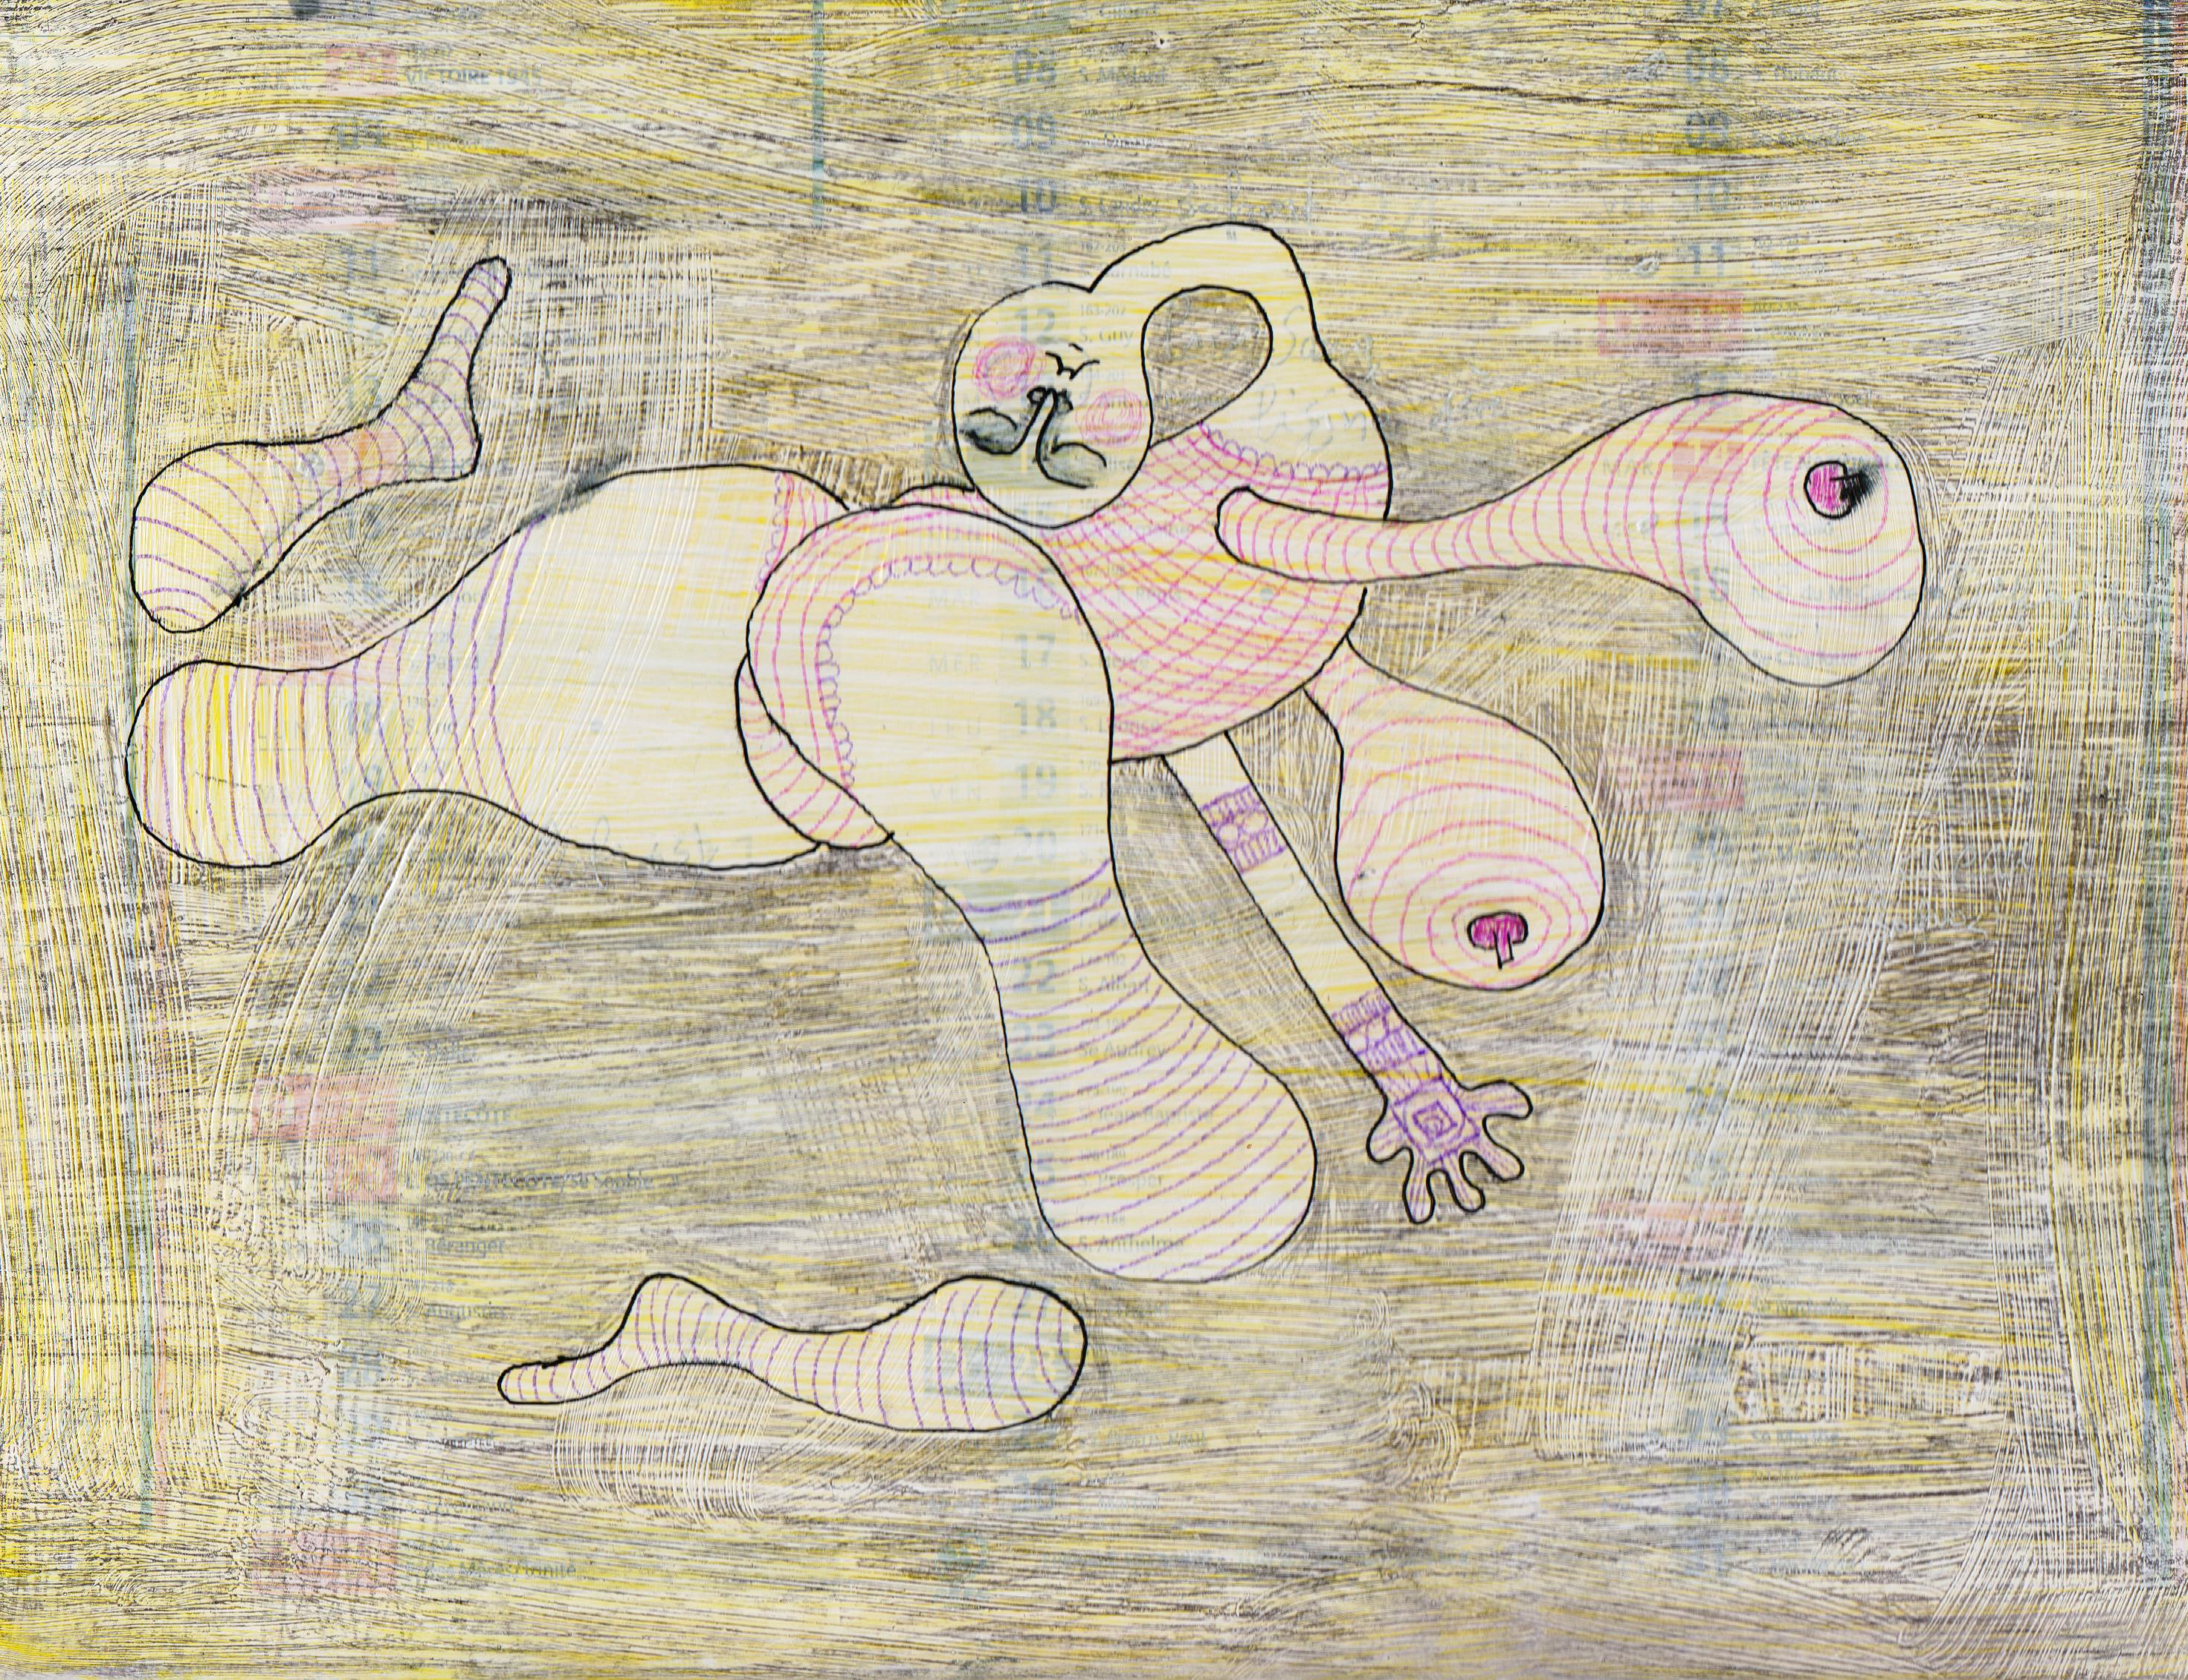 Femme pressée, 25x17 cm